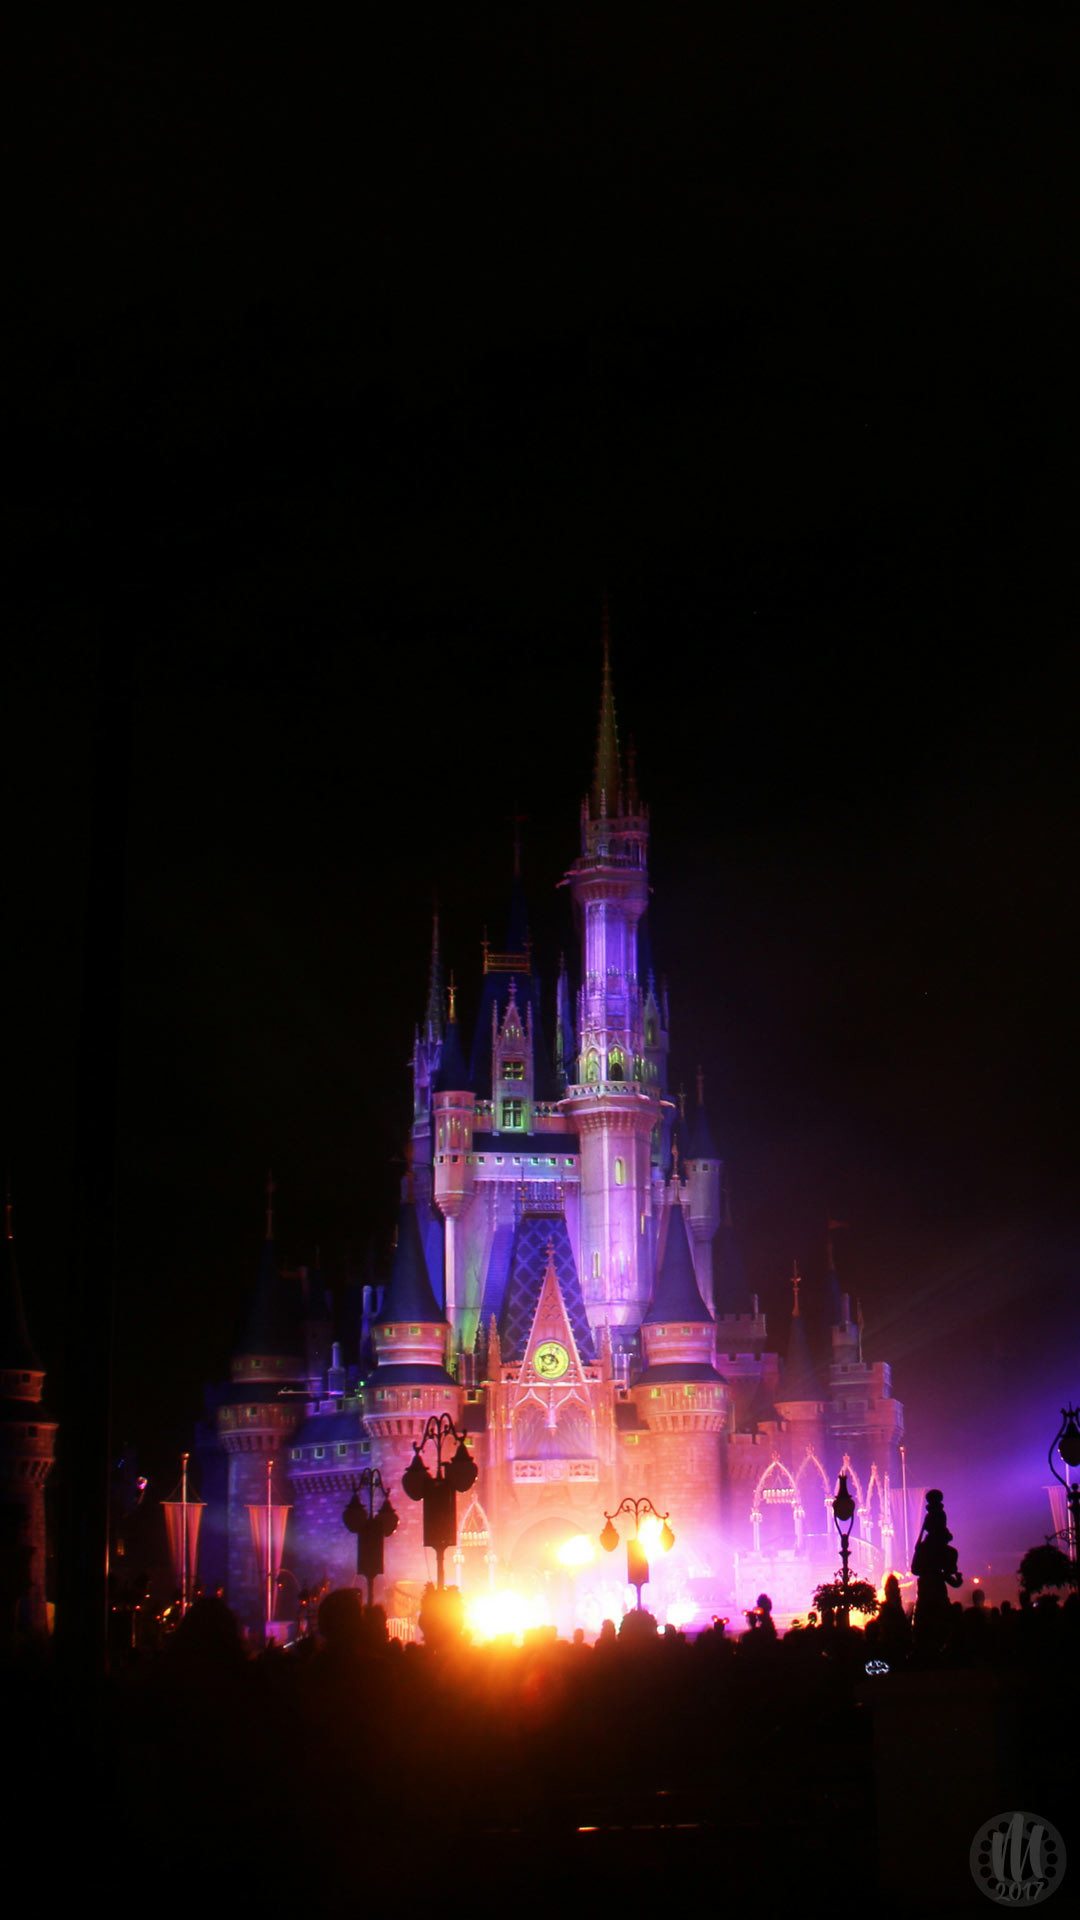 Disney world wallpapers 56 images - Disney world wallpaper iphone ...